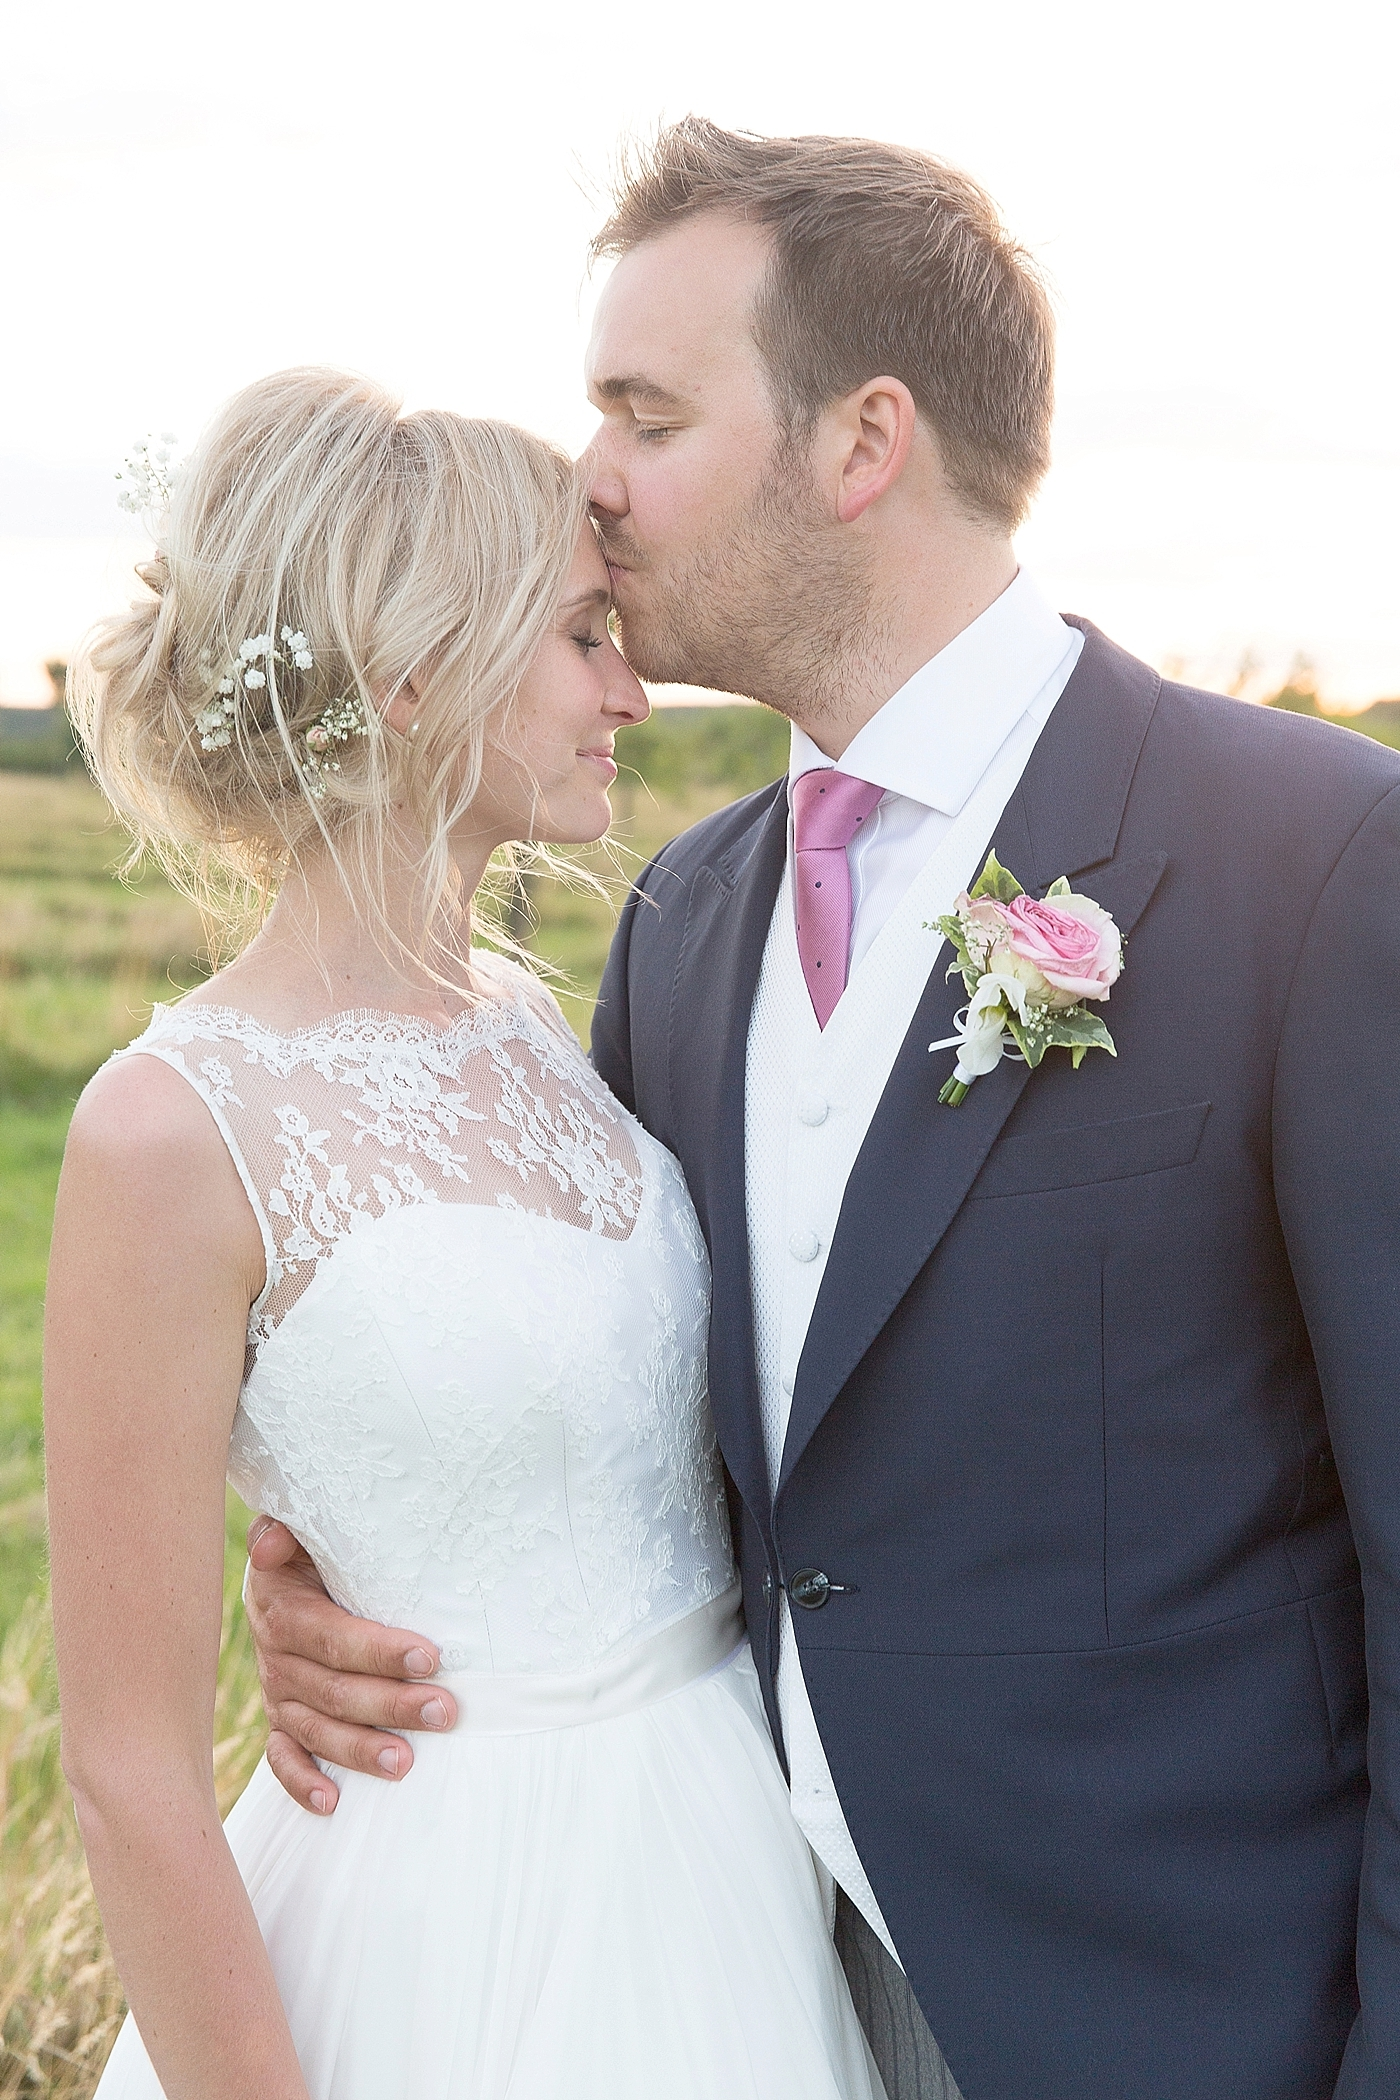 groom kisses brides head at wedding at Lyveden New Bield